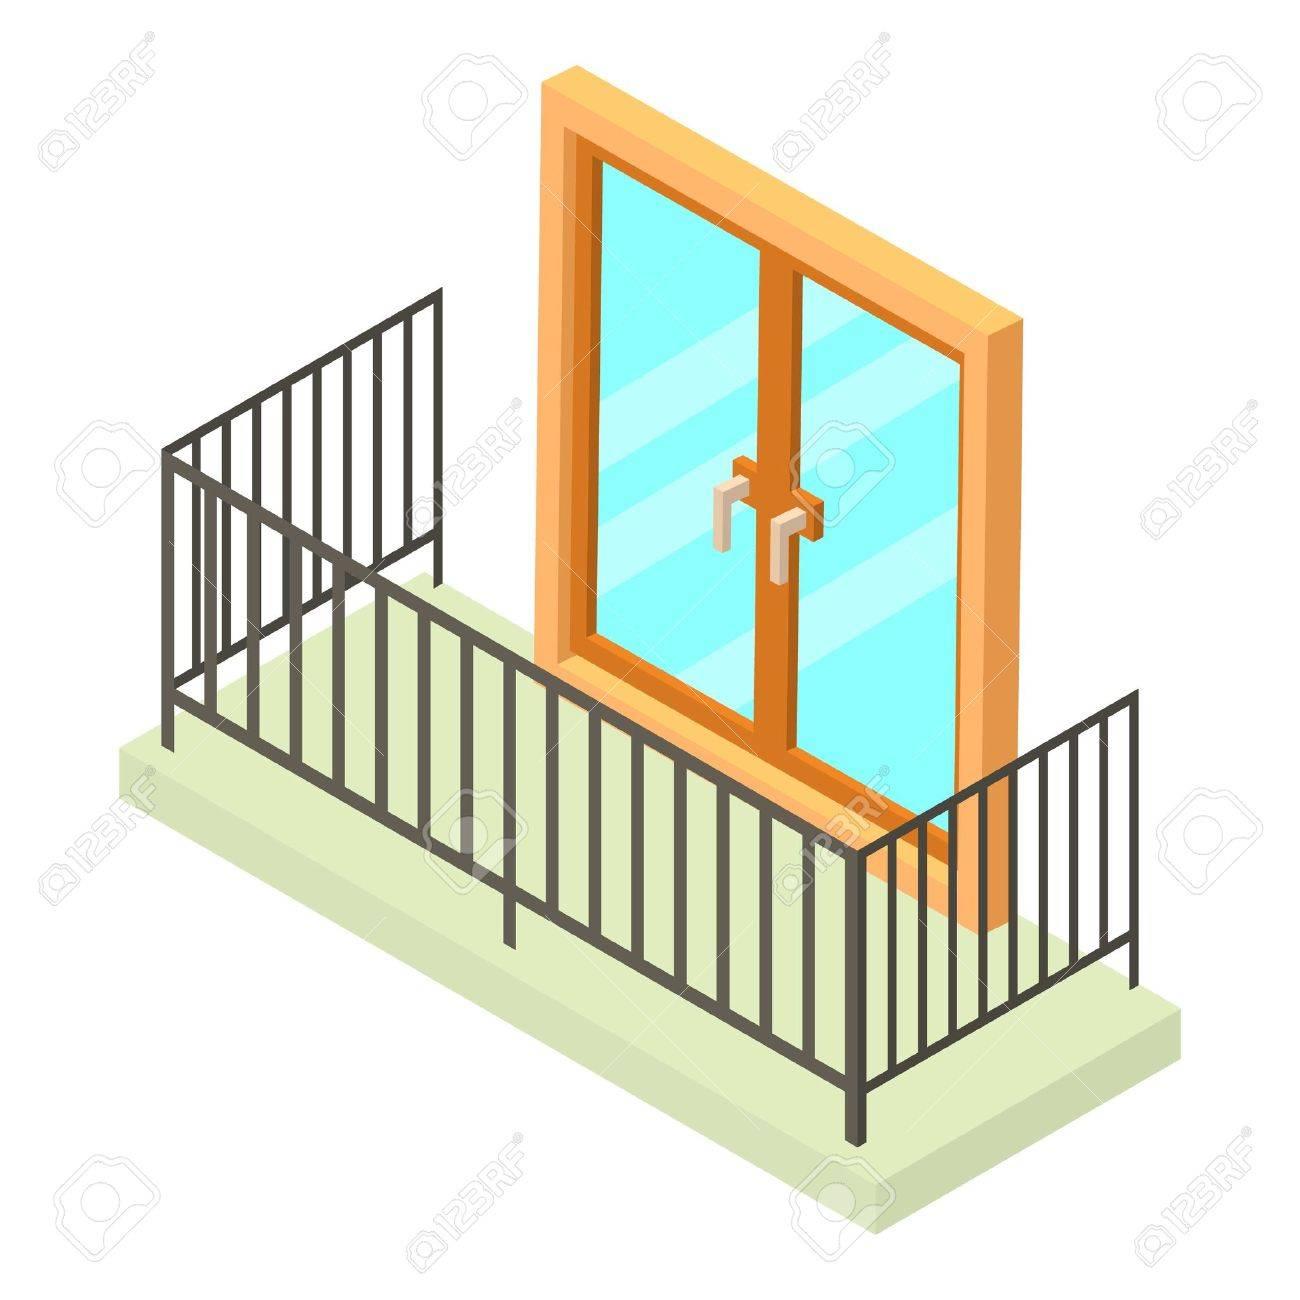 Balcony icon. Isometric illustration of balcony vector icon for...